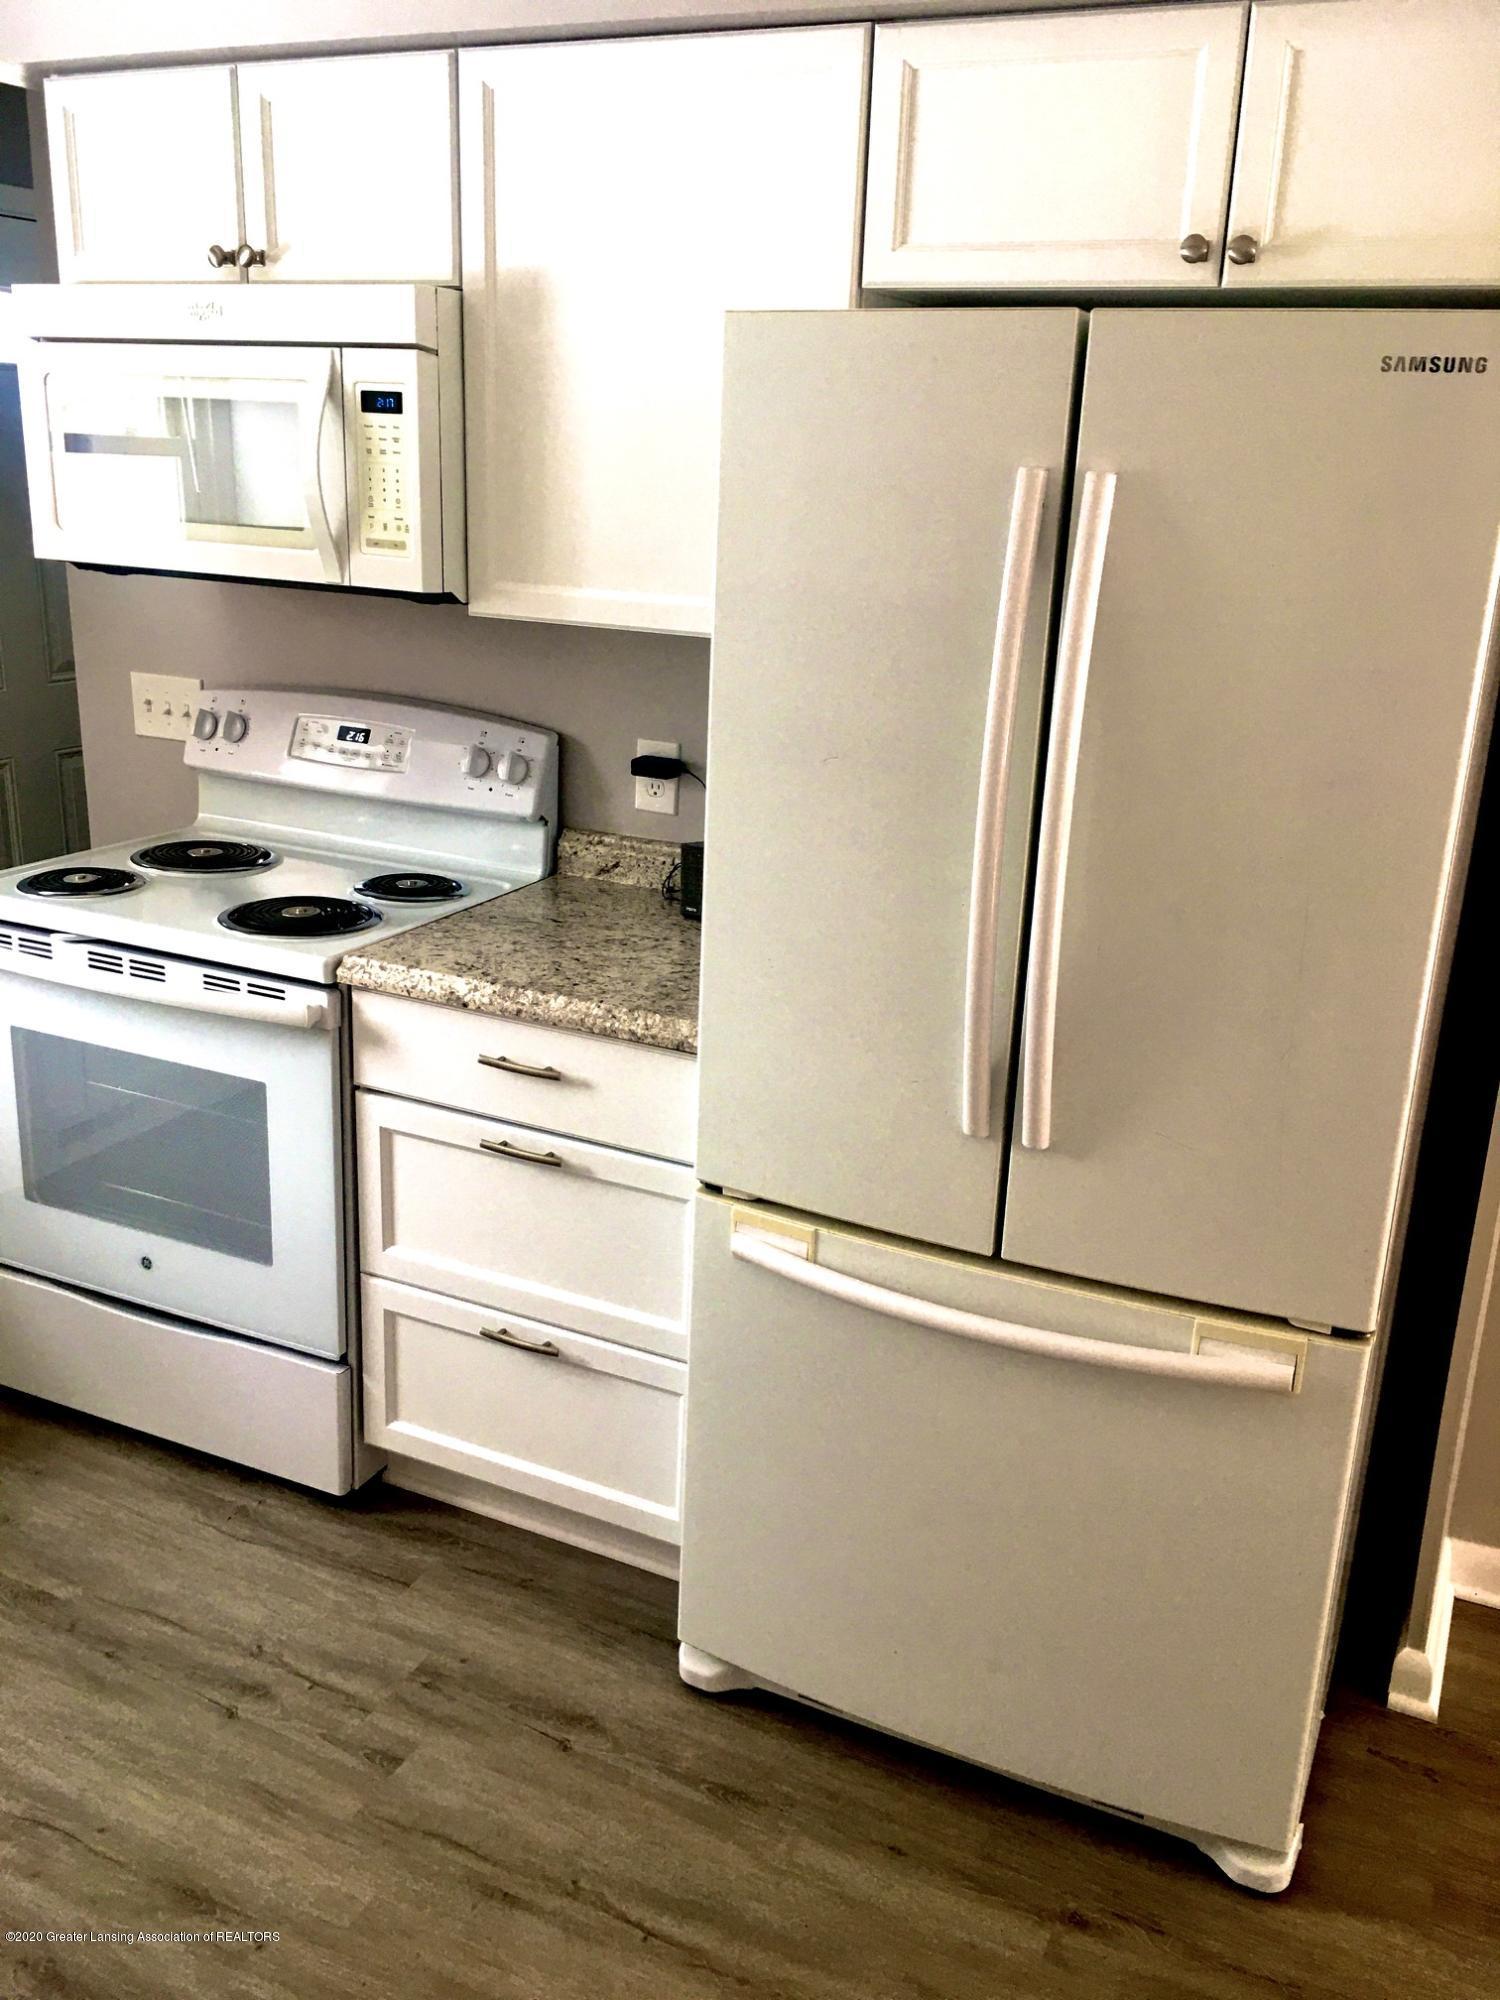 903 Tisdale Ave - Kitchen-frig-stove - 3